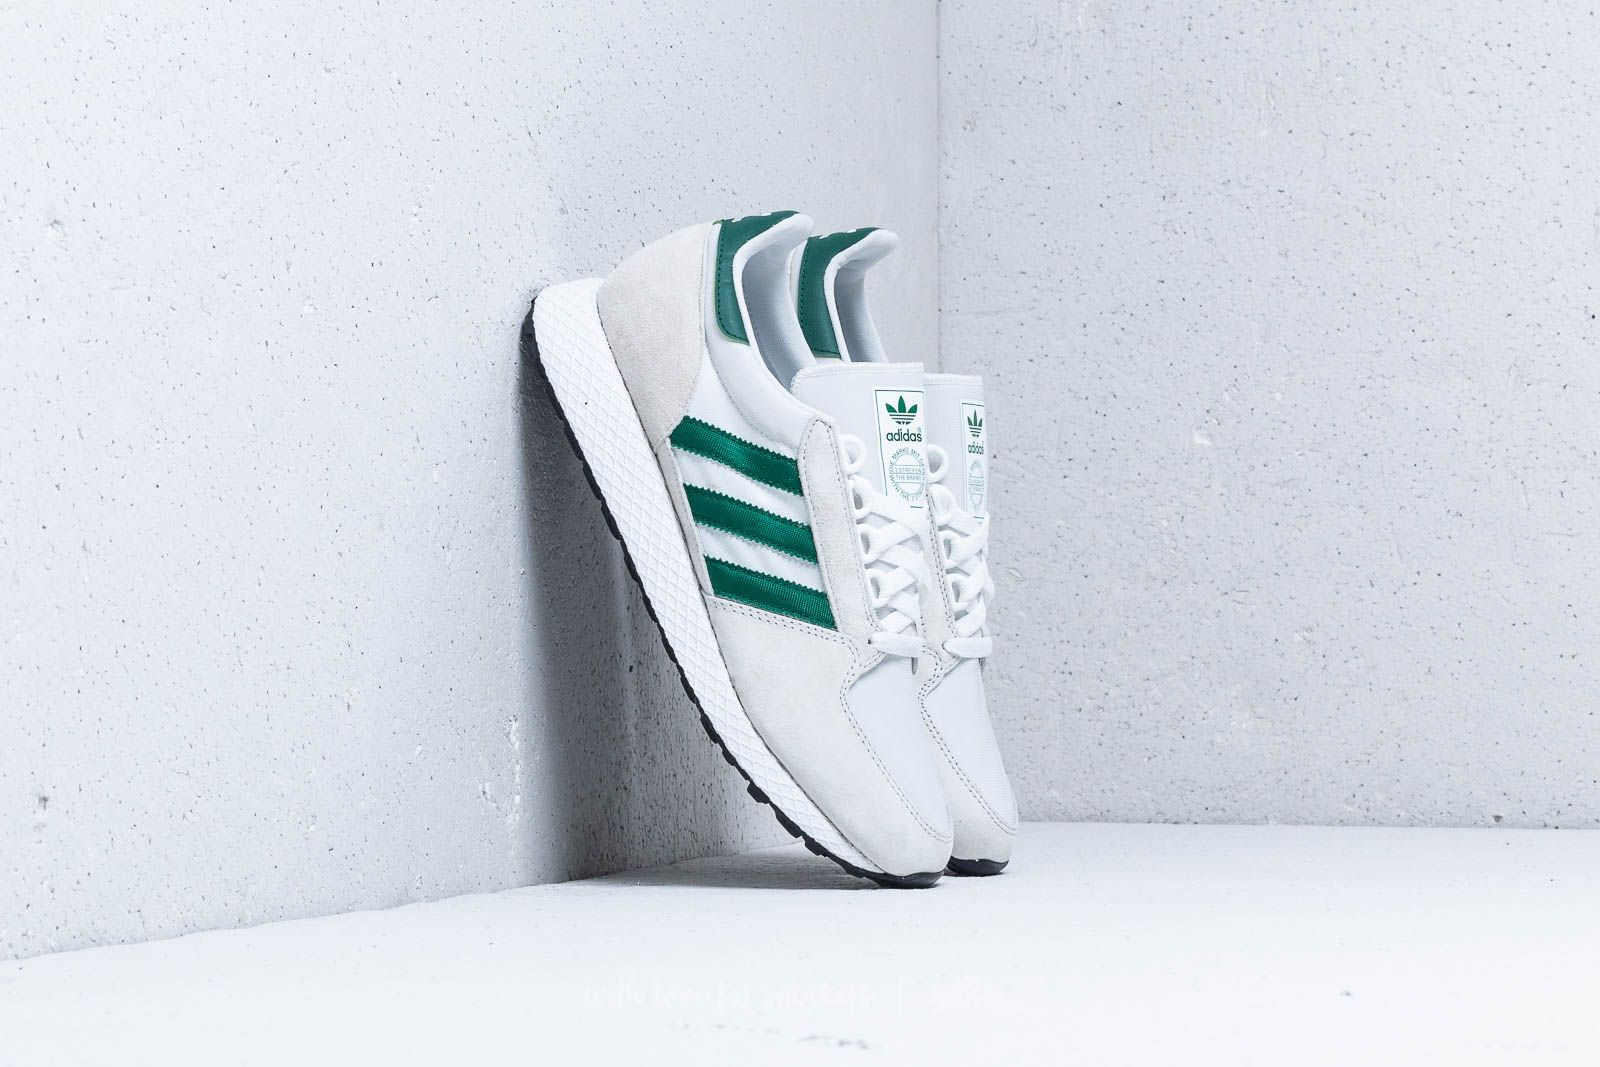 b19eb9a5ab2 adidas Forest Grove Crystal White/ Collegiate Green/ Core Black ...